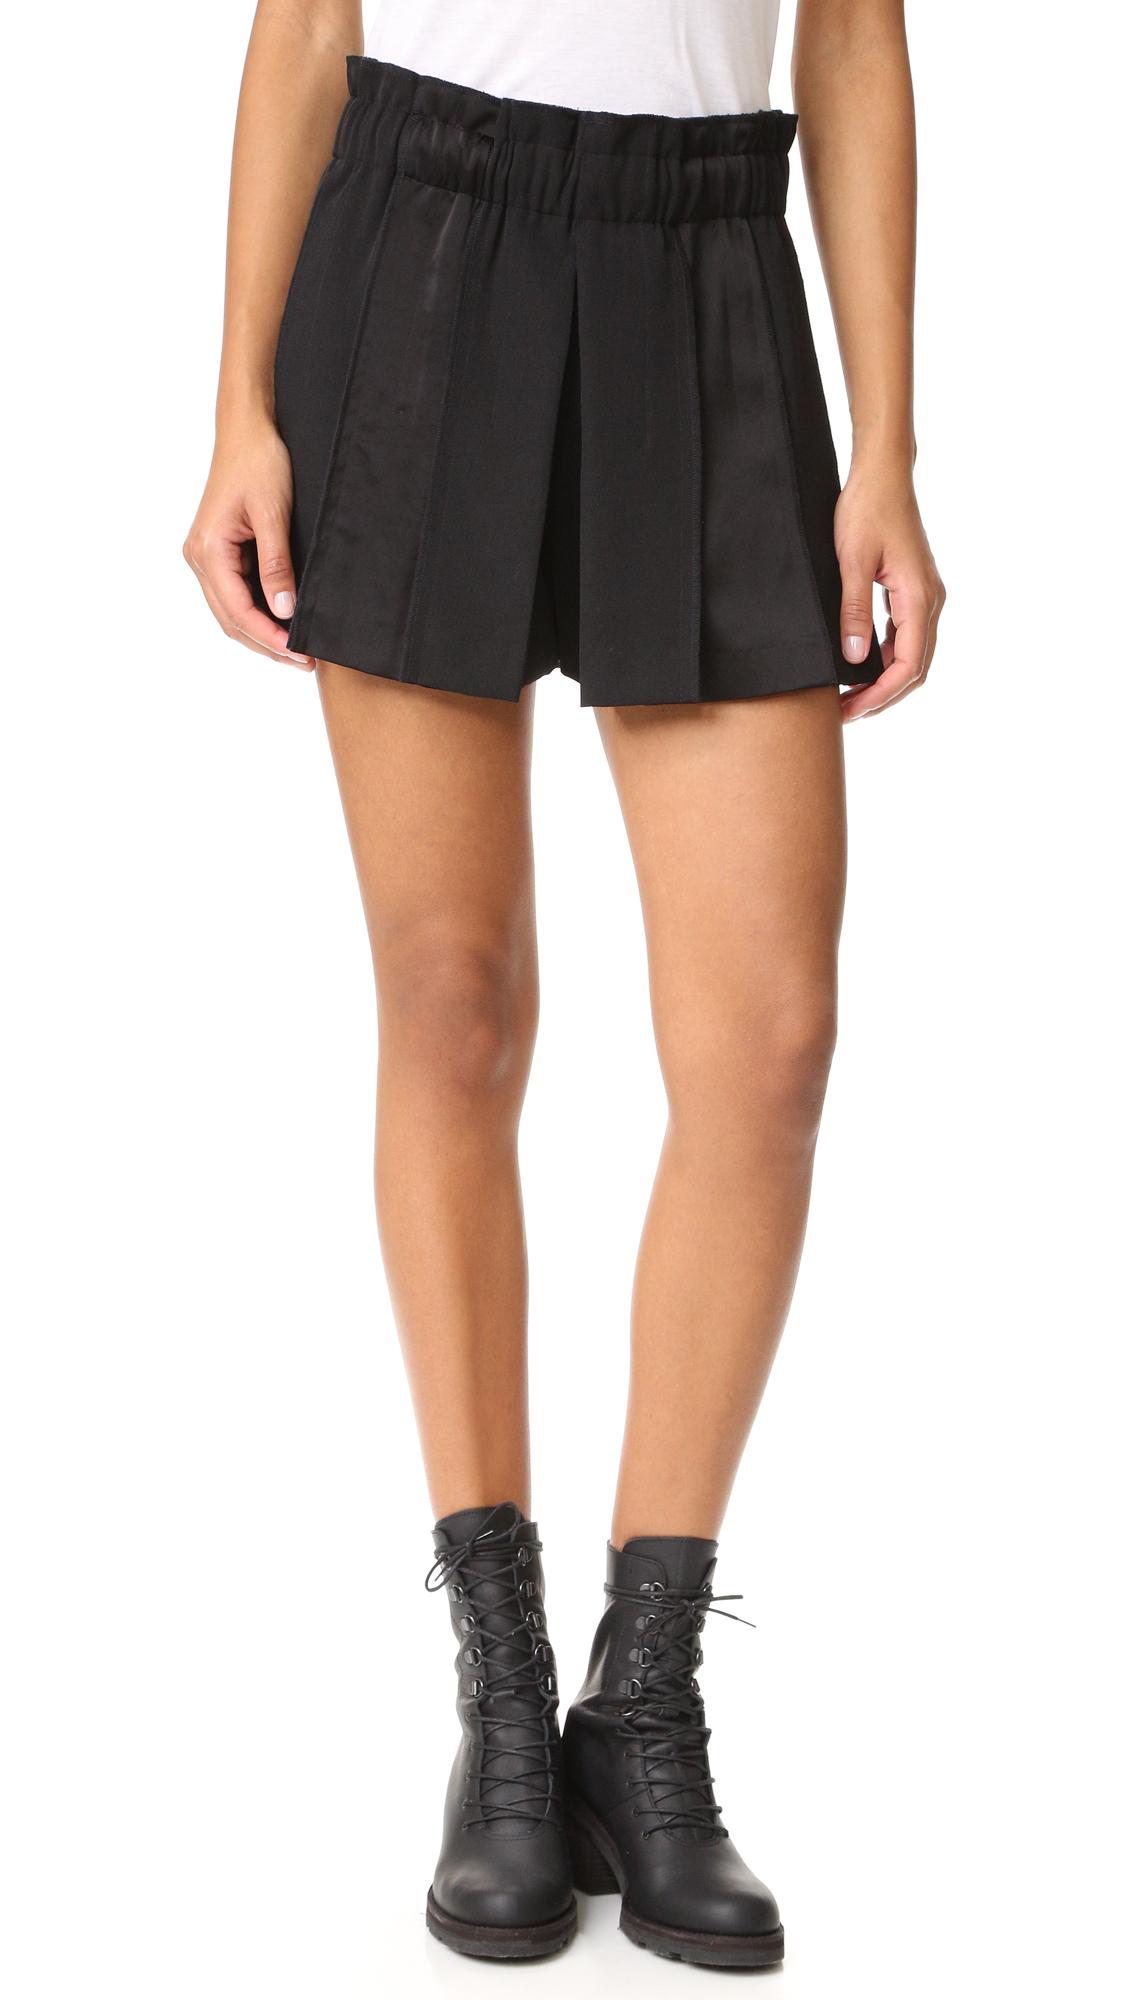 Dkny Pull On Paneled Shorts - Black at Shopbop